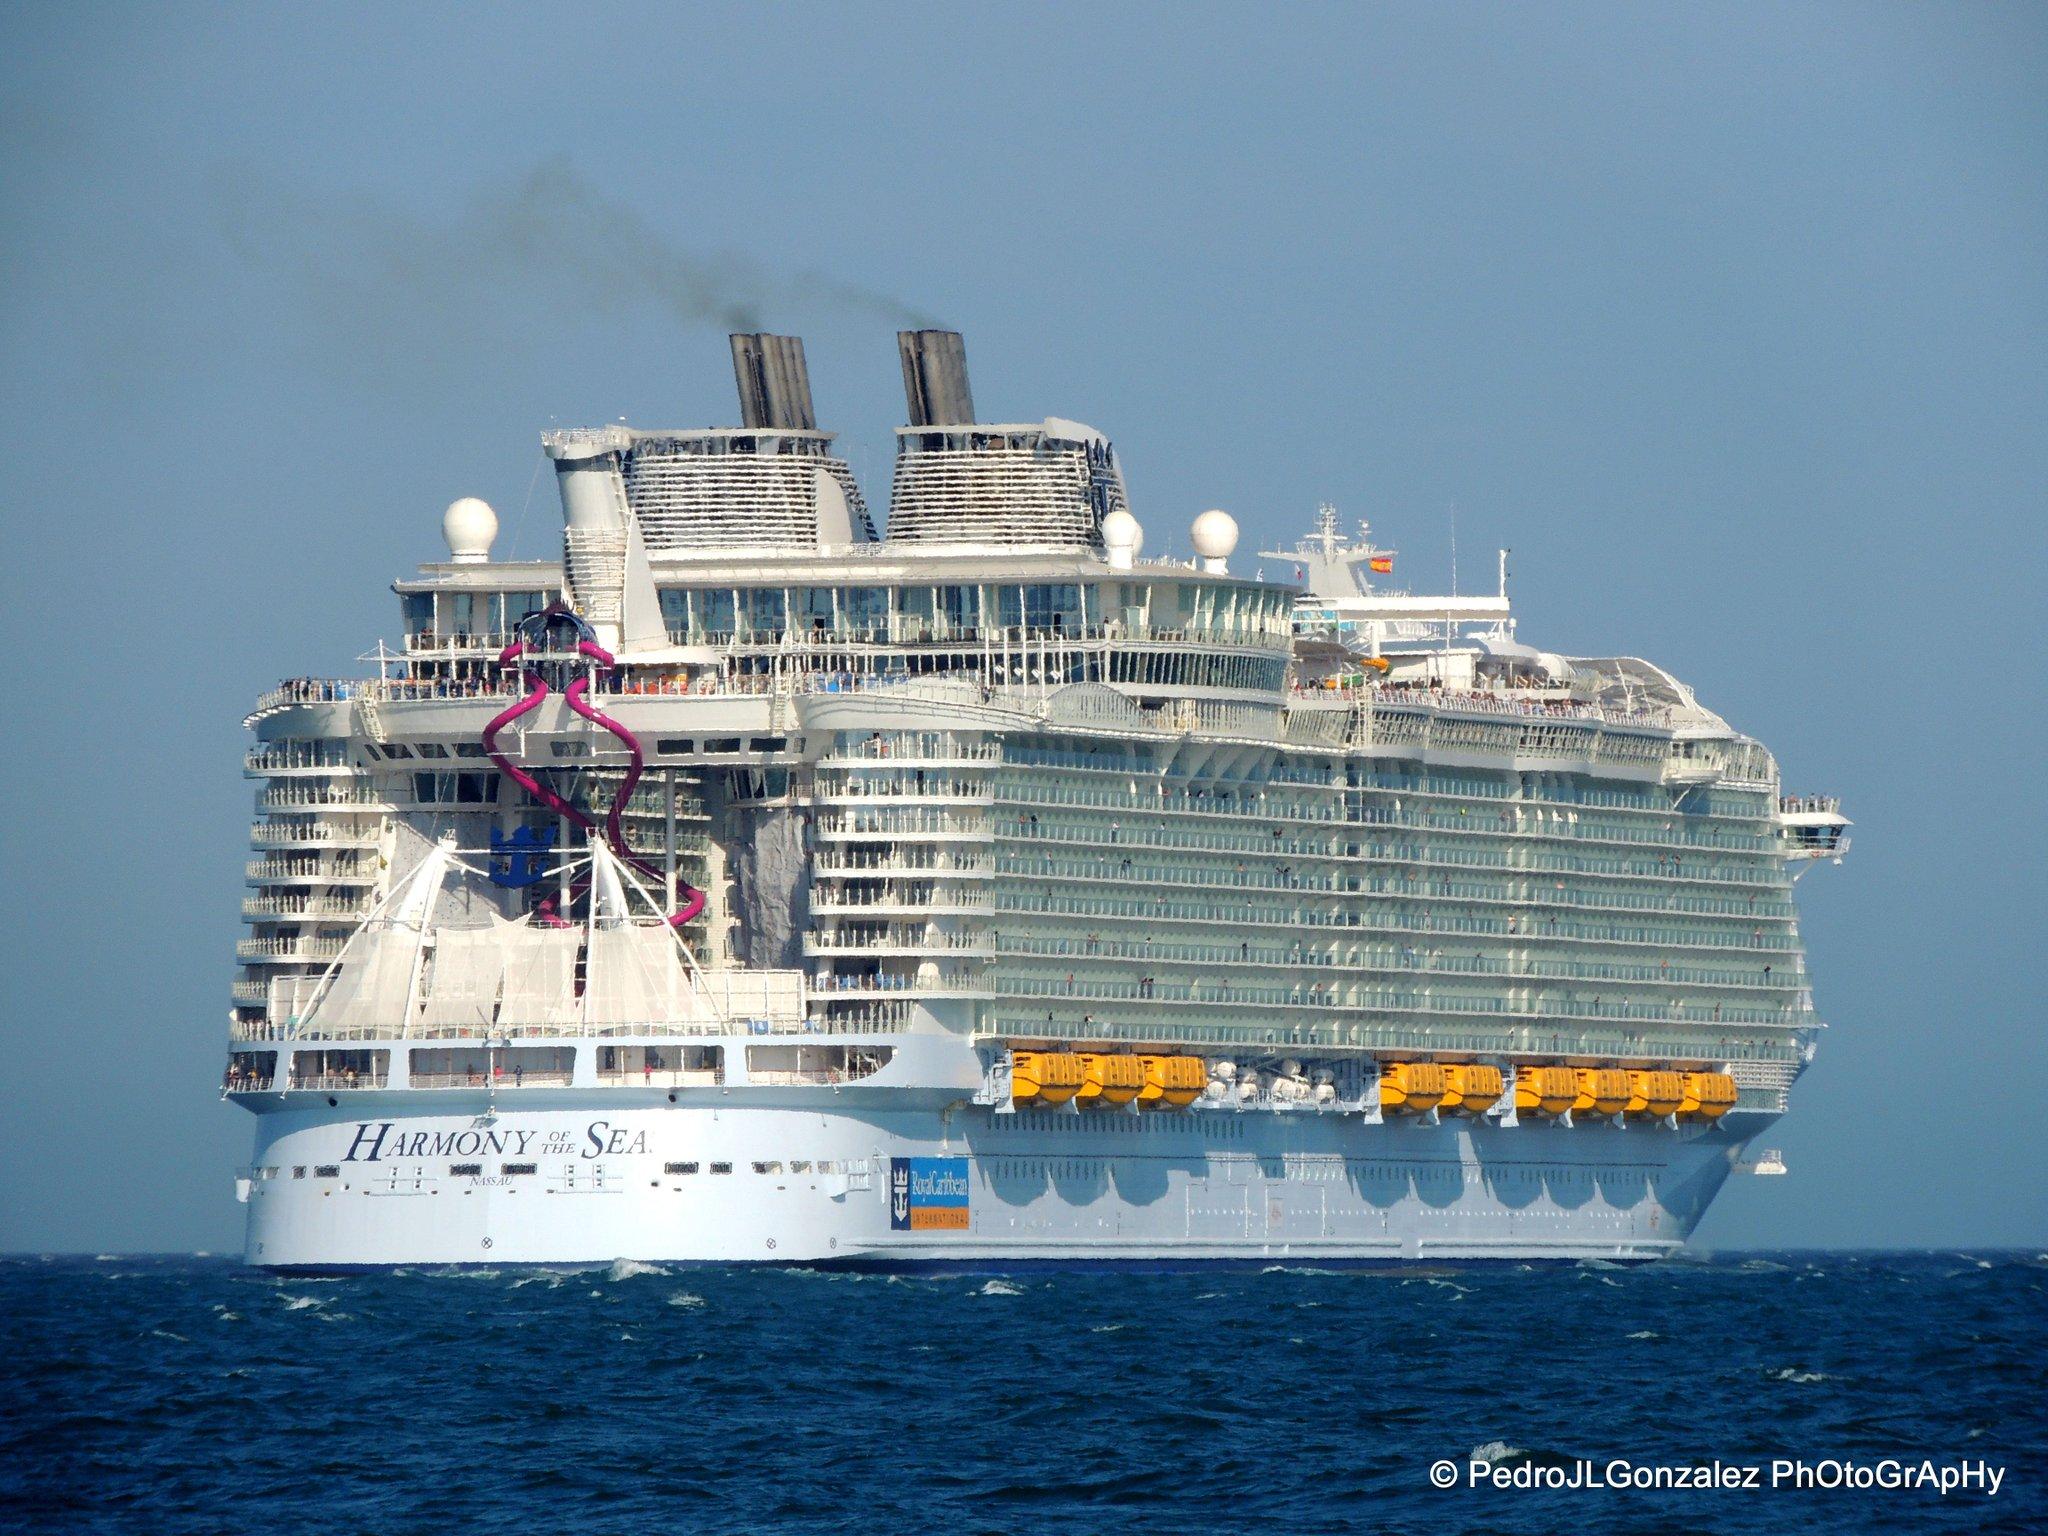 #RoyalCaribbean @DiarioSUR La escala de hoy en #Malaga del crucero #HarmonyoftheSeas. Impresionante. https://t.co/7vKgwWitXr